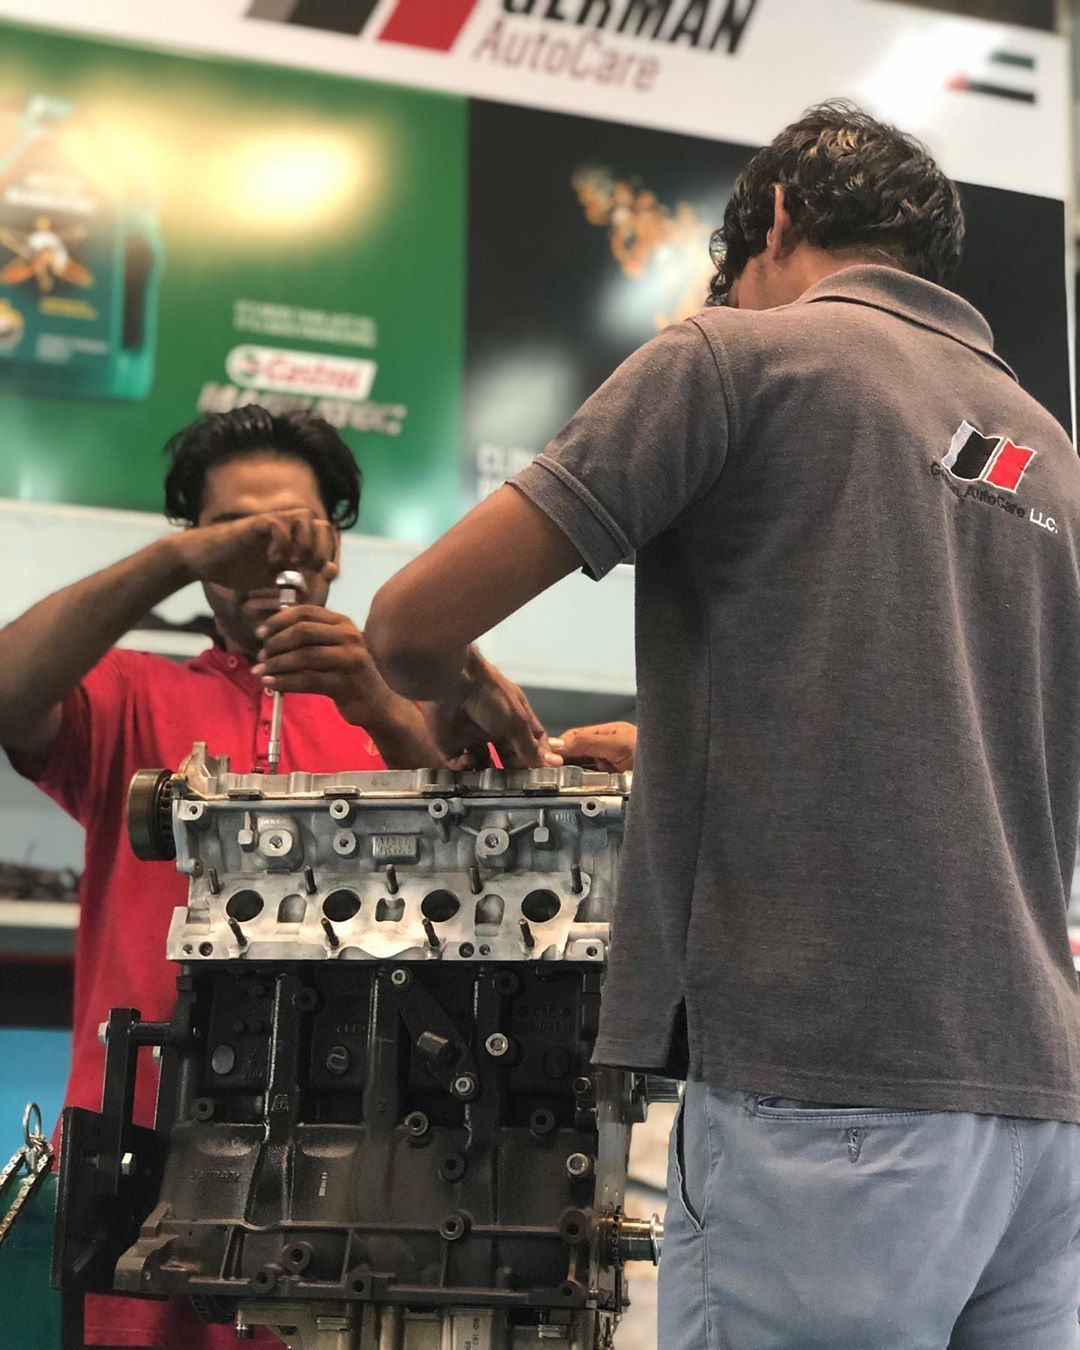 German Auto Care Car repair service, Car oil change